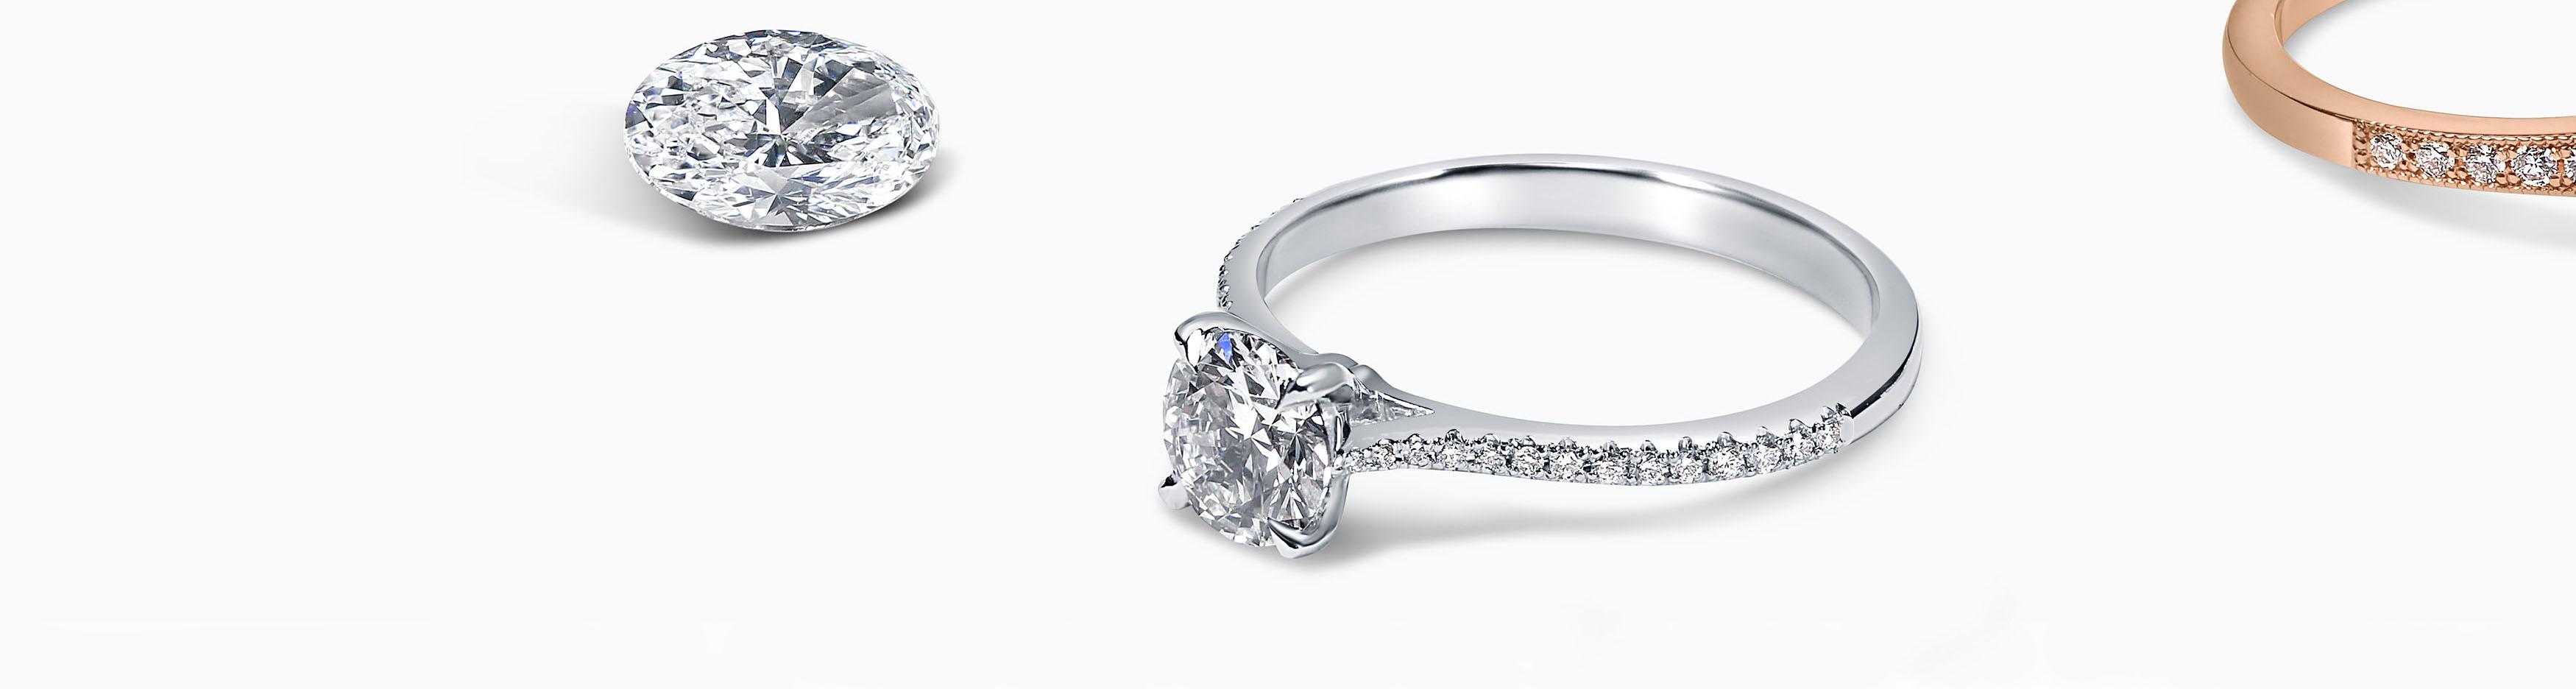 Large Diamond Rings